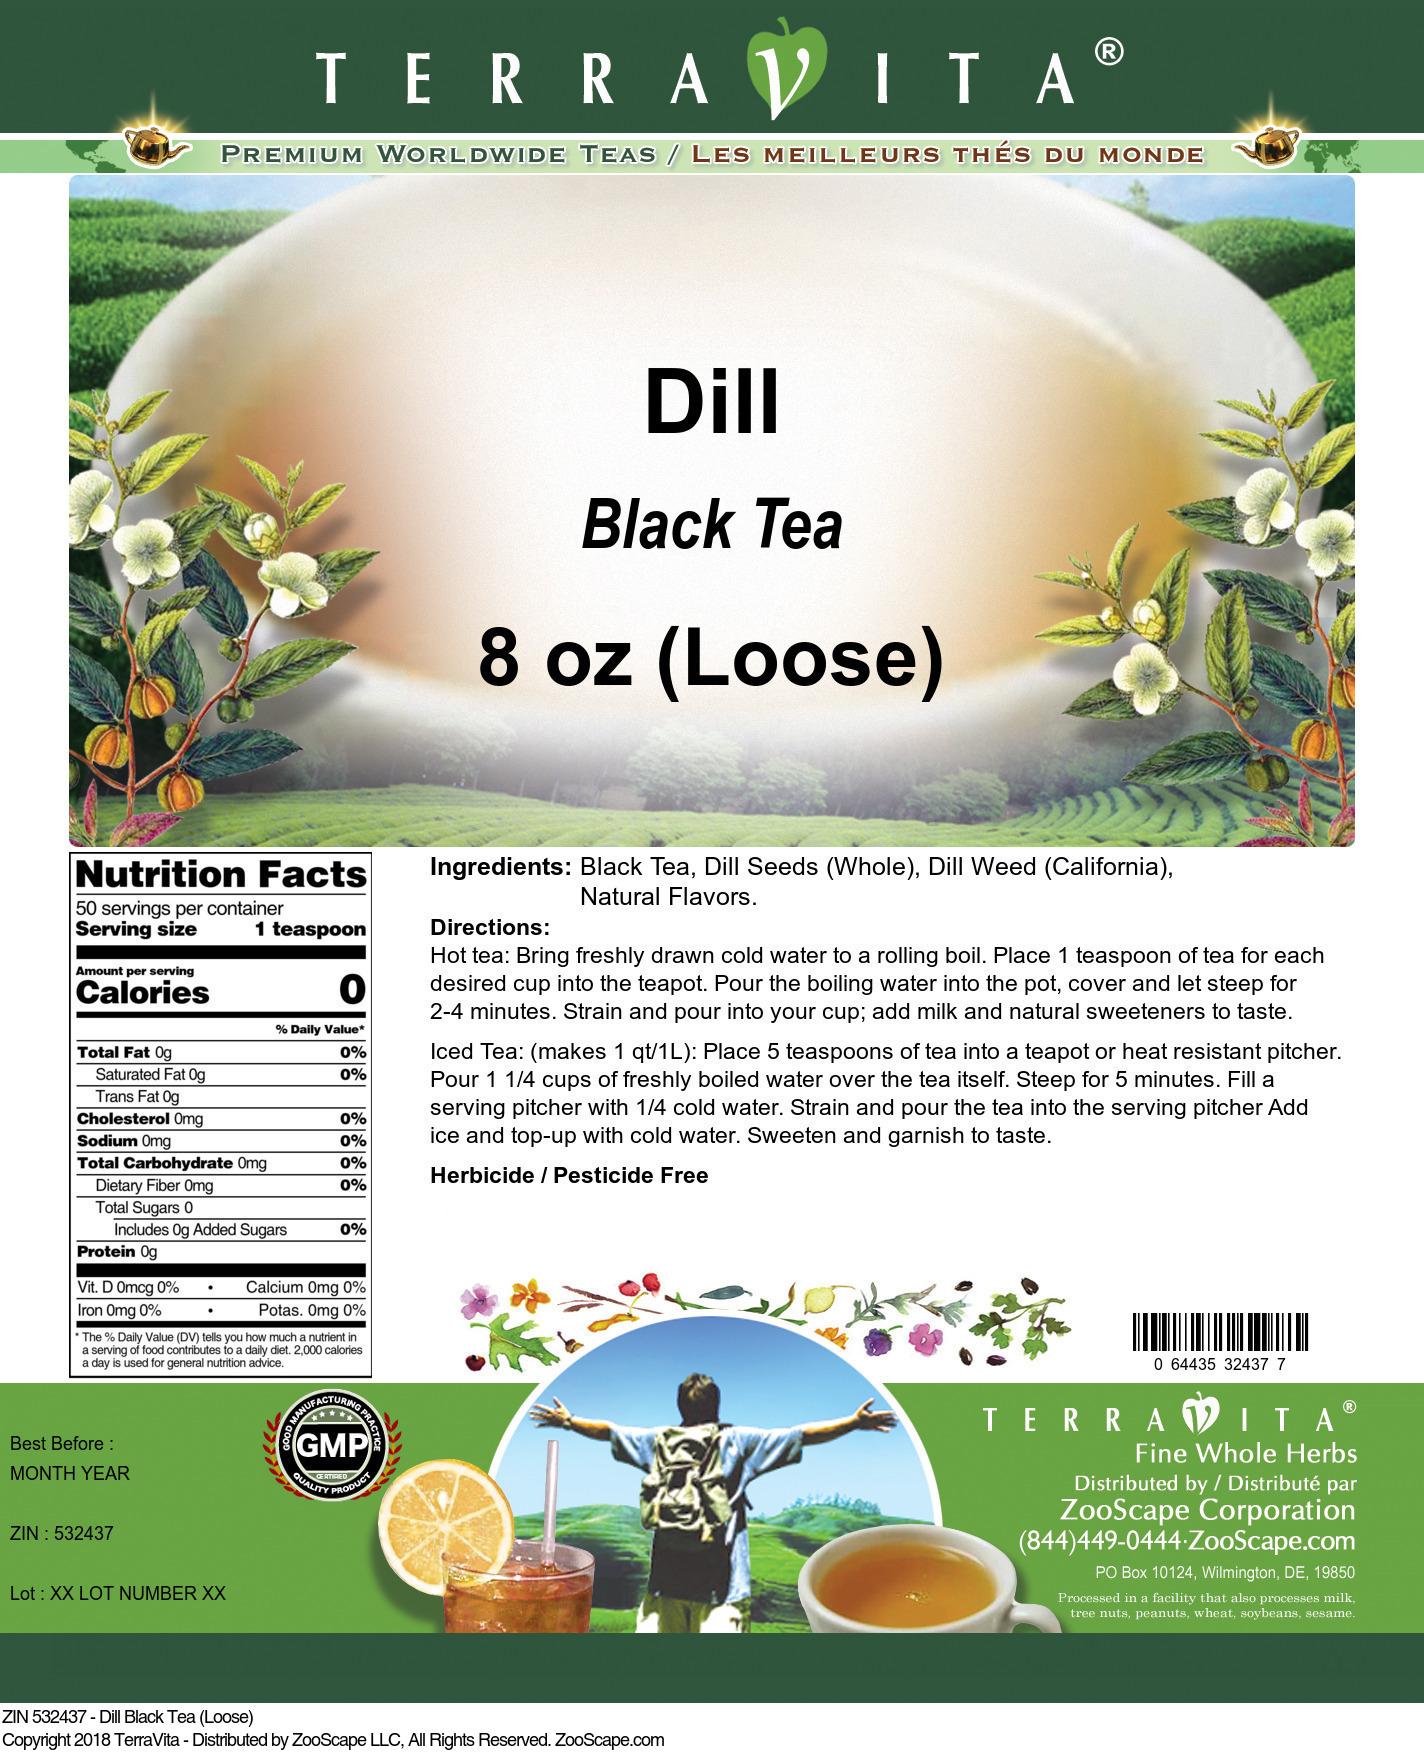 Dill Black Tea (Loose)